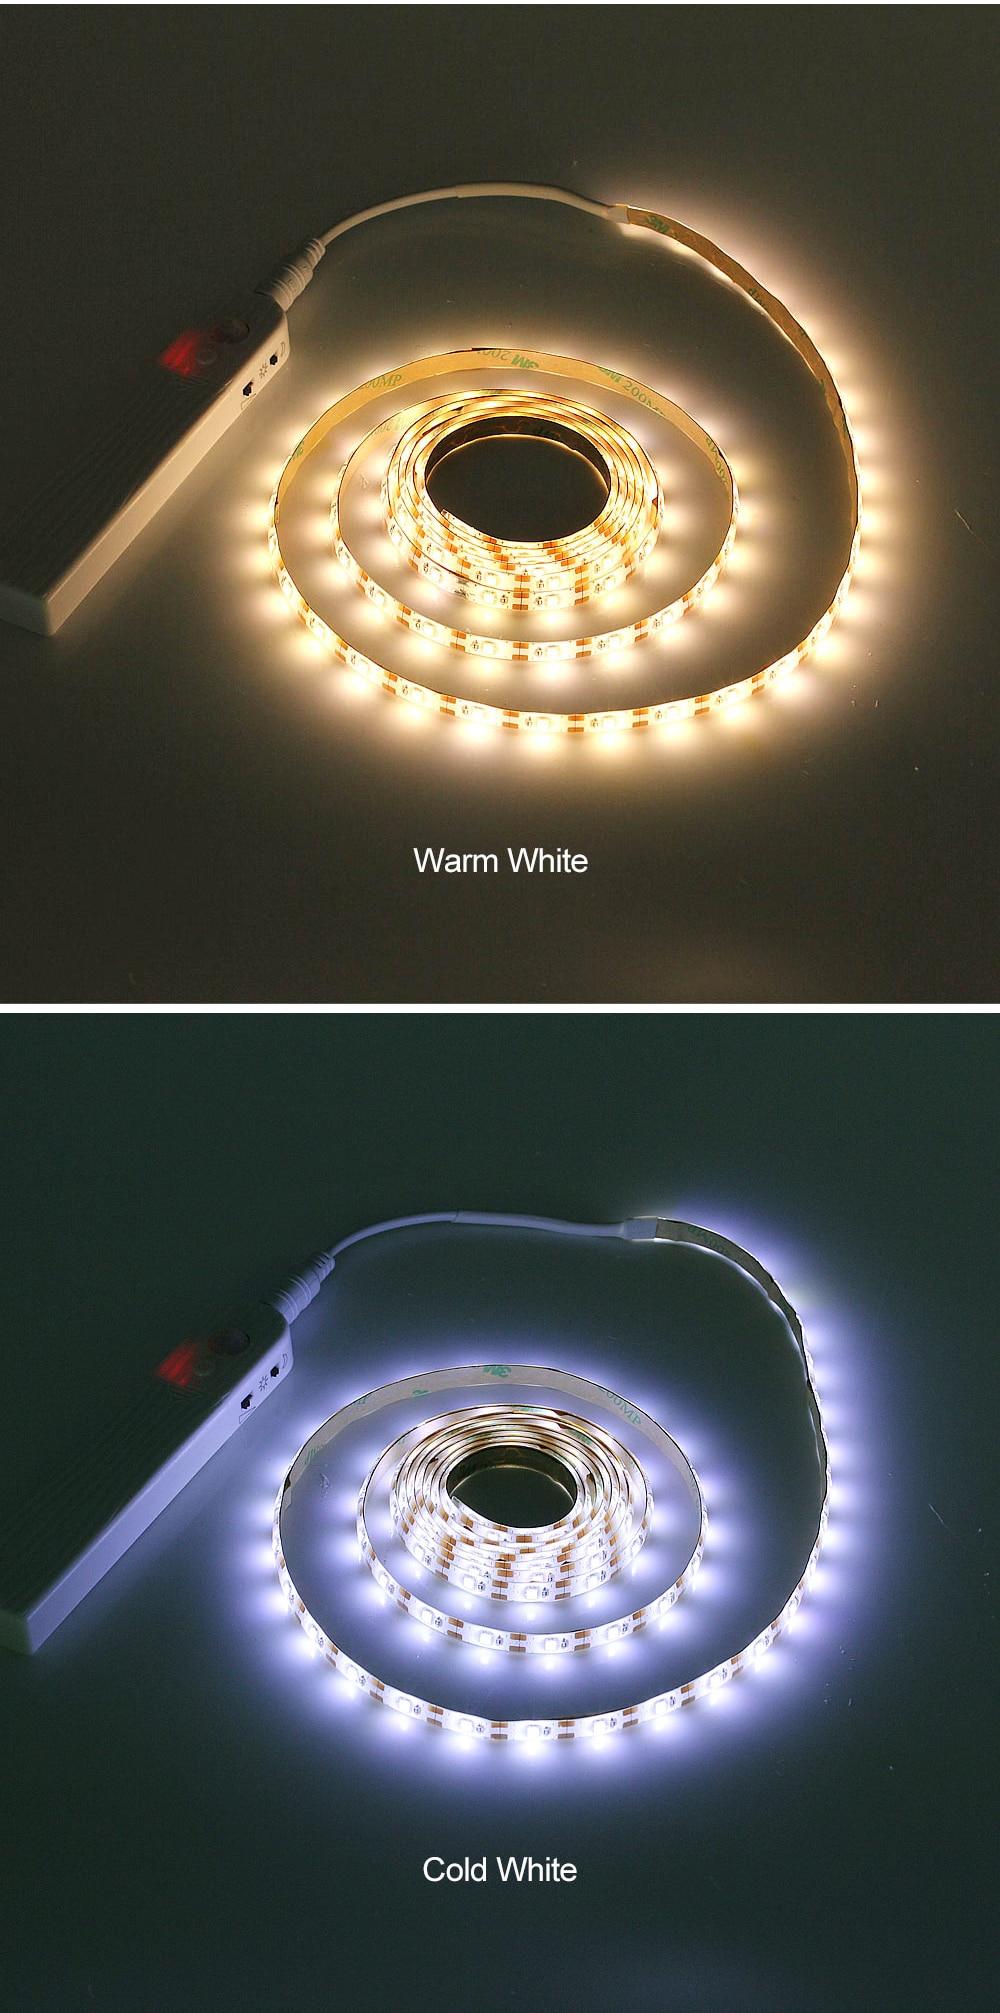 HTB1KOGhJqSWBuNjSsrbq6y0mVXa9 ANBLUB 1M 2M 3M Motion Sensor LED Night light Bed Cabinet Stairs light LED Strip lamp Battery Powered For TV Backlight lighting